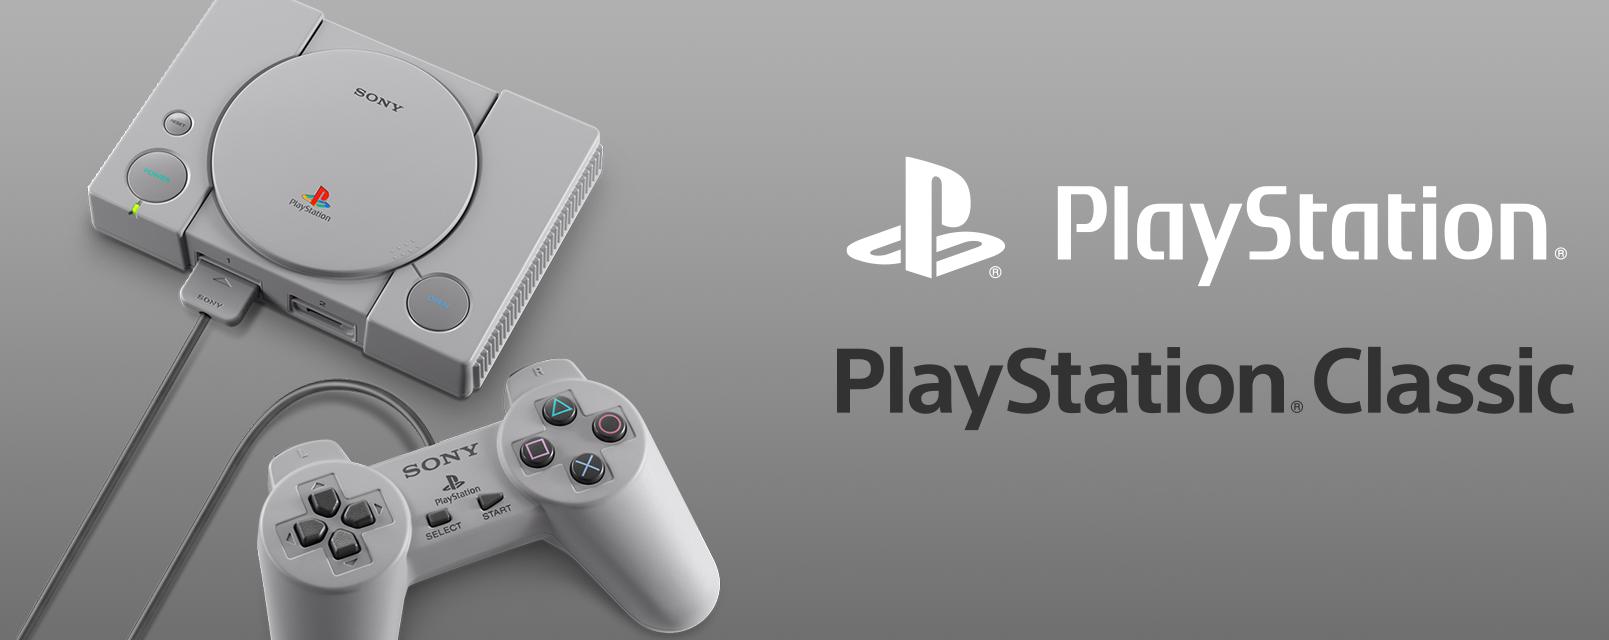 Sony 推出 PlayStation 迷你復刻主機,復古遊戲機成潮流